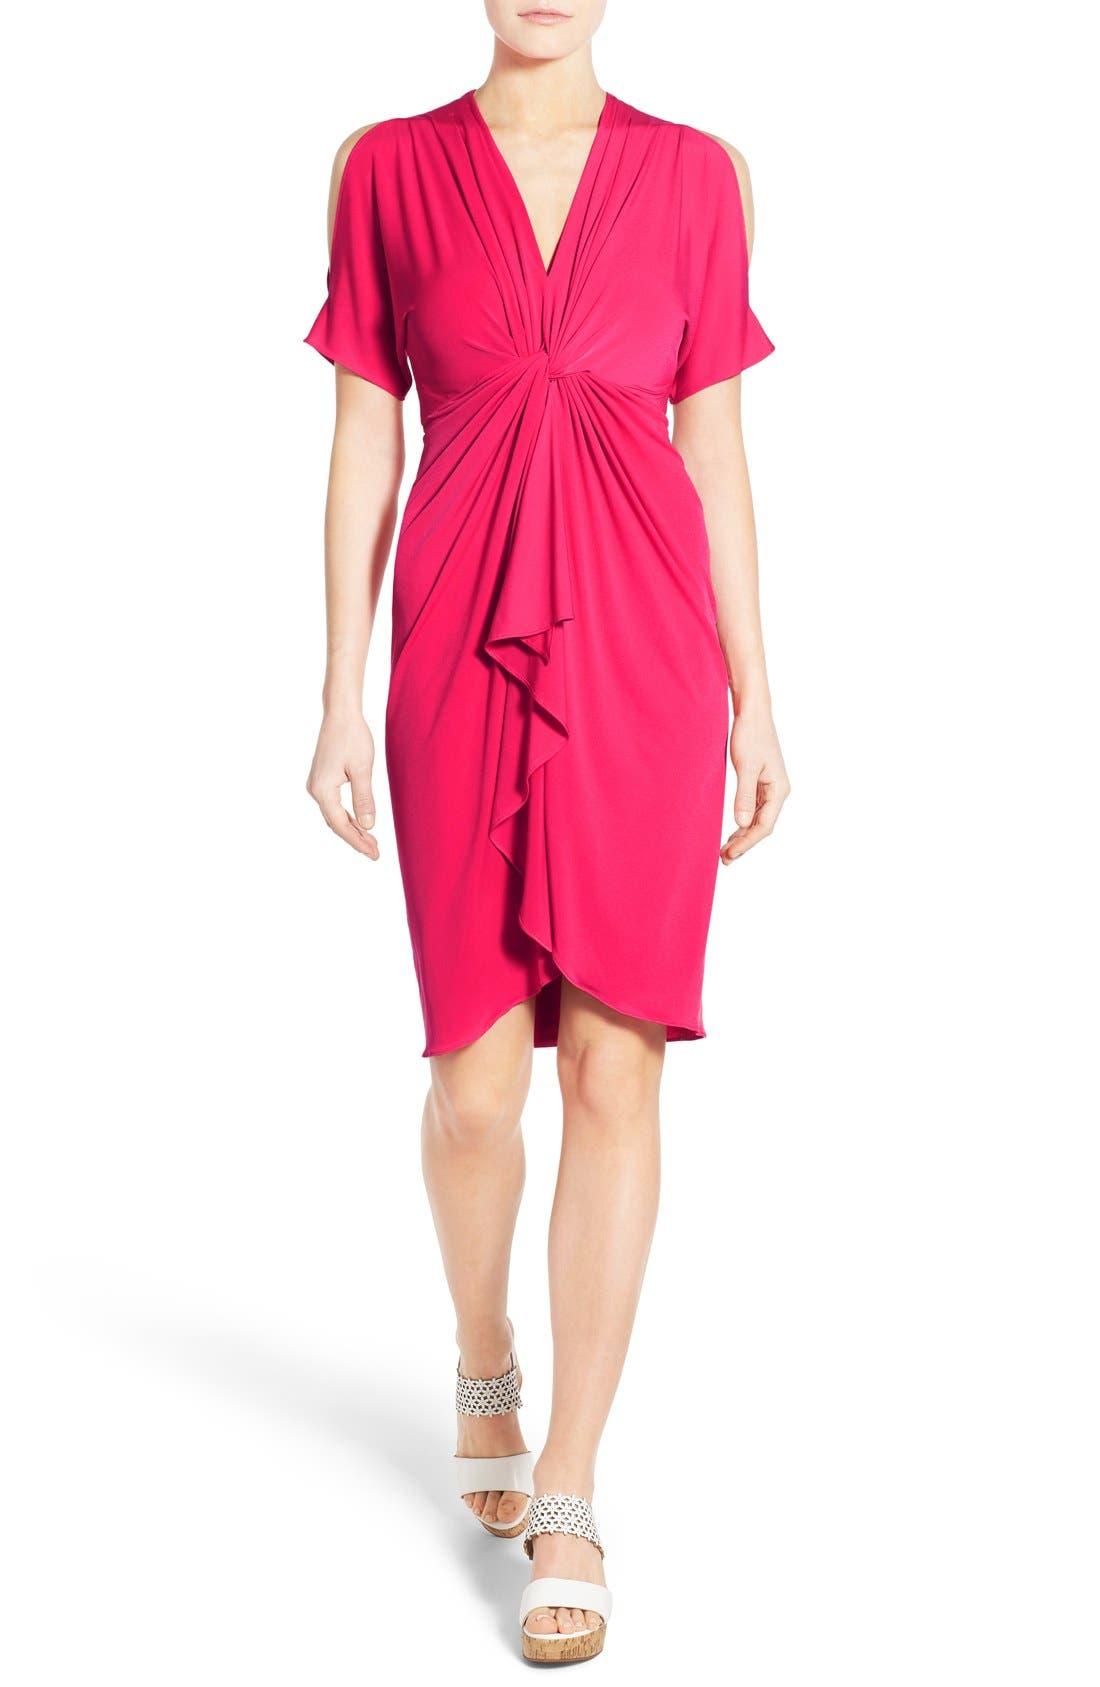 Alternate Image 1 Selected - Catherine Catherine Malandrino 'Emily' Cold Shoulder Twist Front Dress